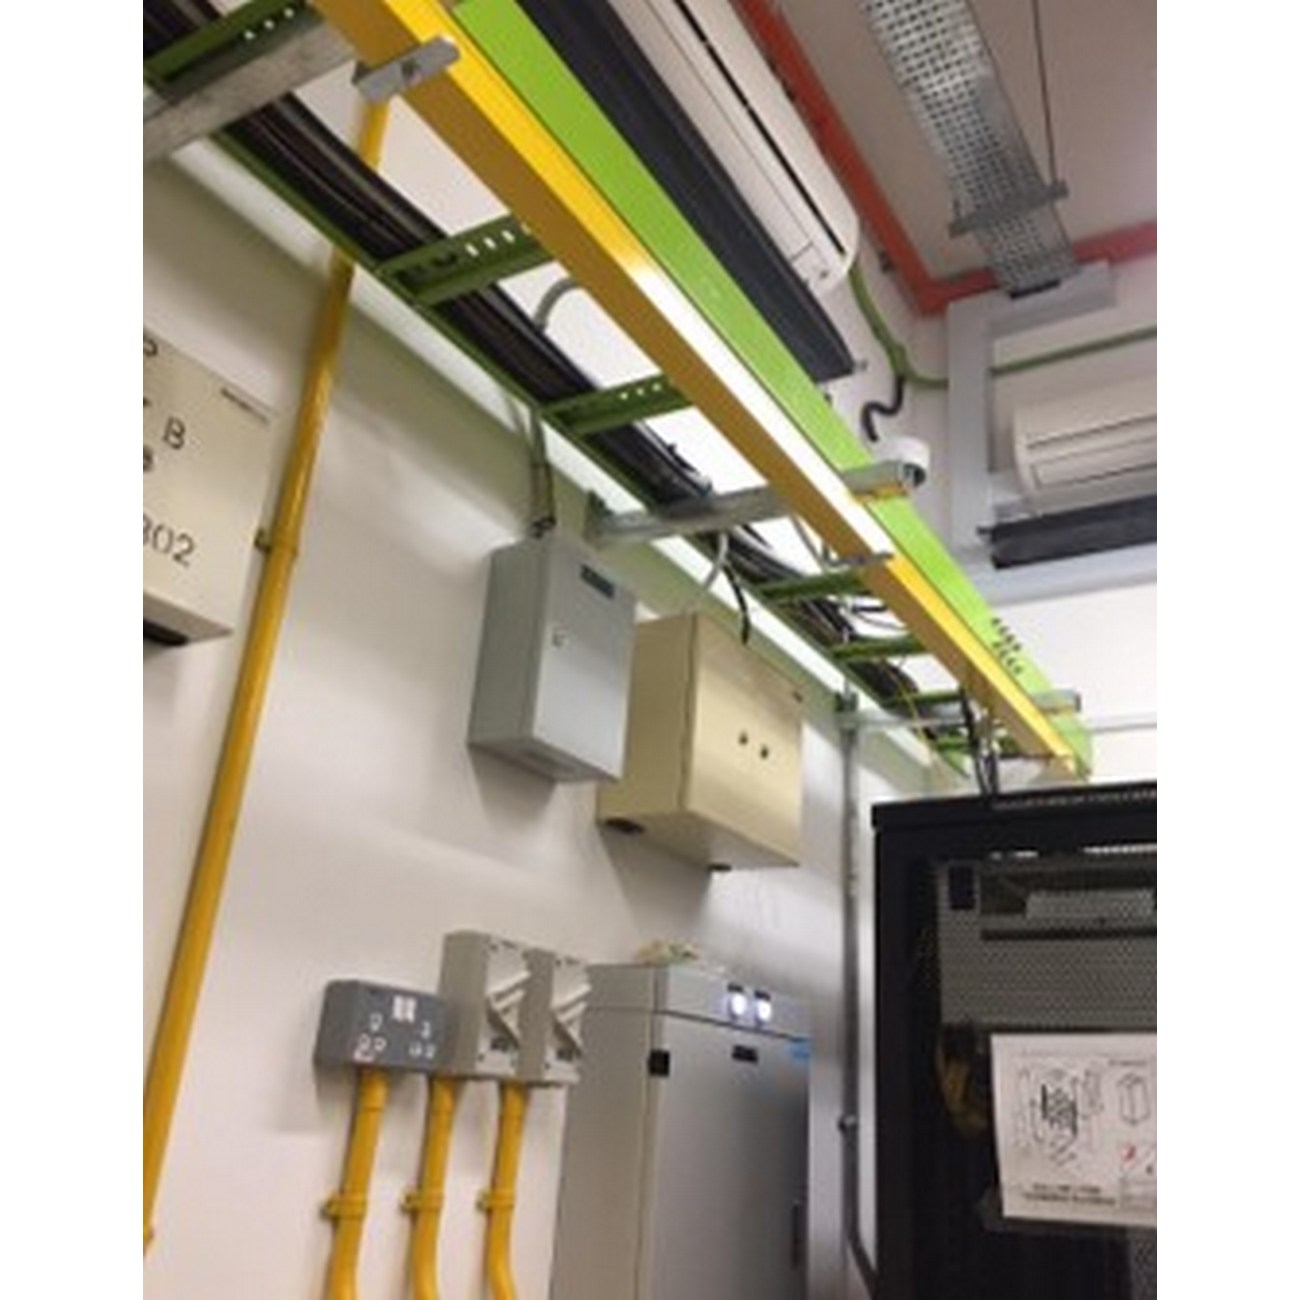 Fiber Optics & Structure Cabling (3)